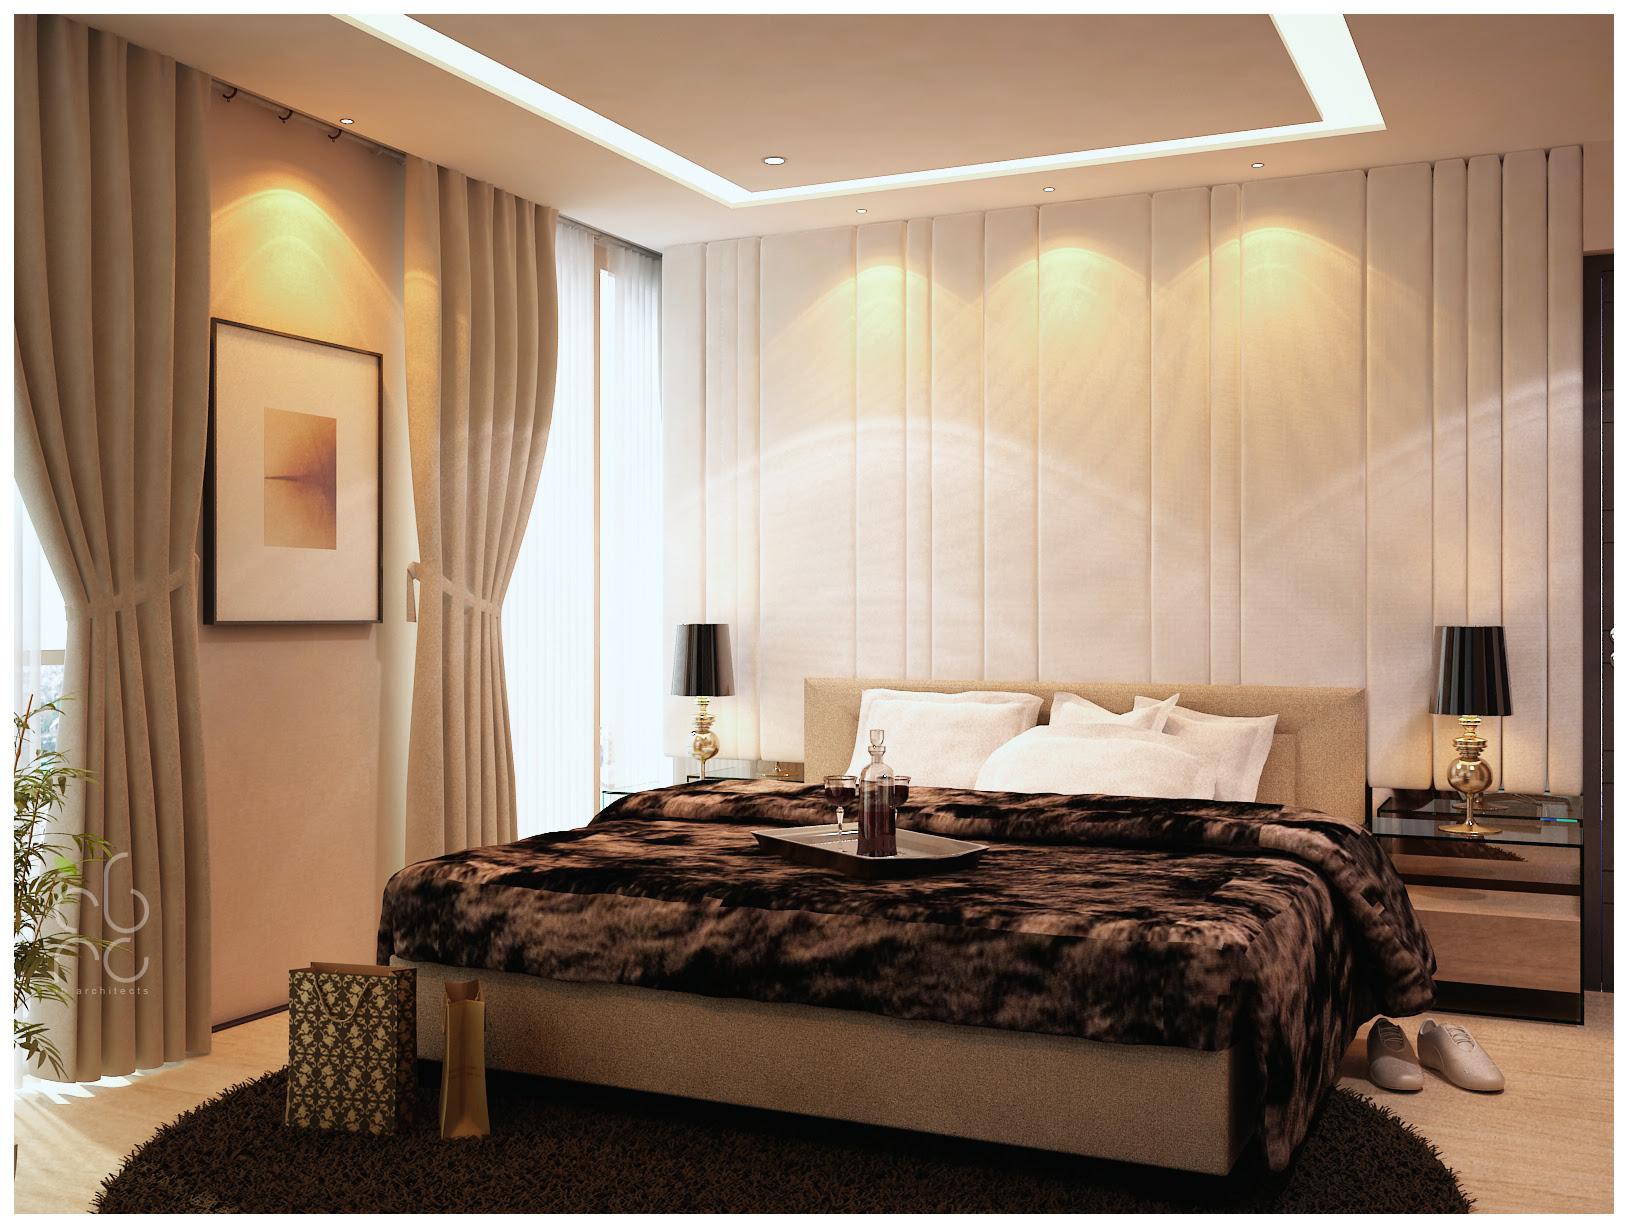 25 Unik Sketsa Kamar Tidur Utama Design Info The Web